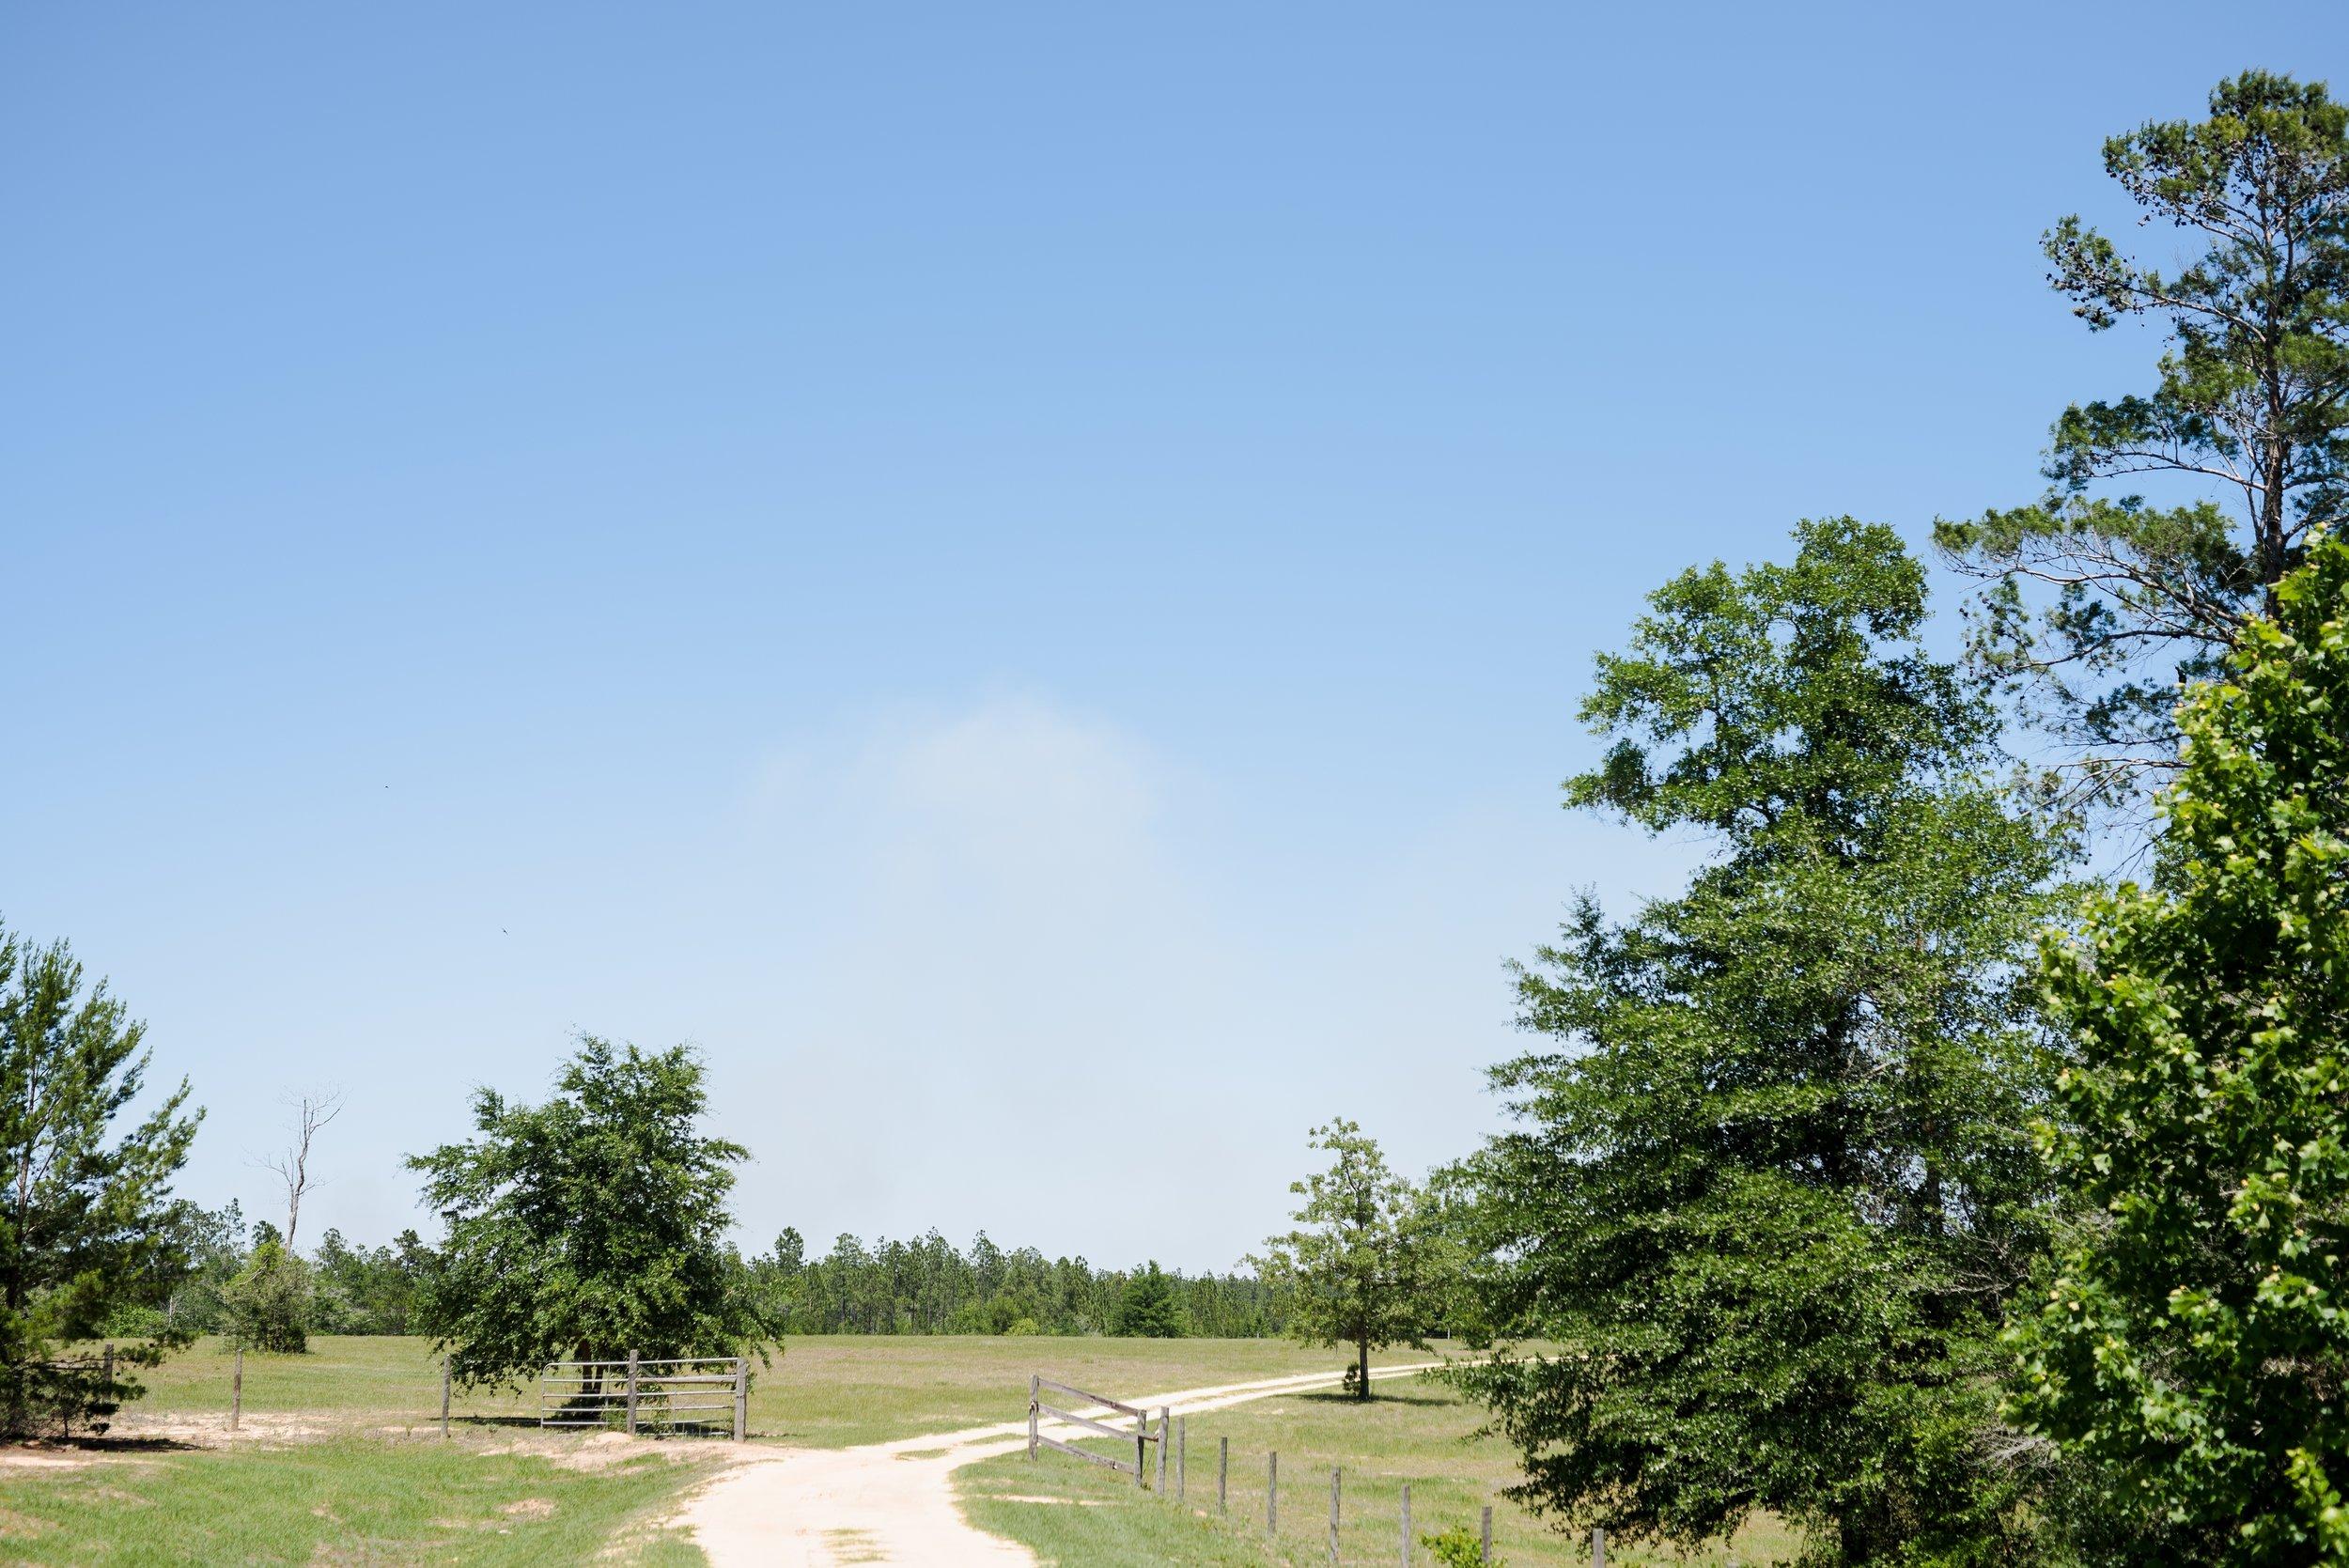 southern-lea-farms-florida-photographer-kiersten-grant-1.jpg